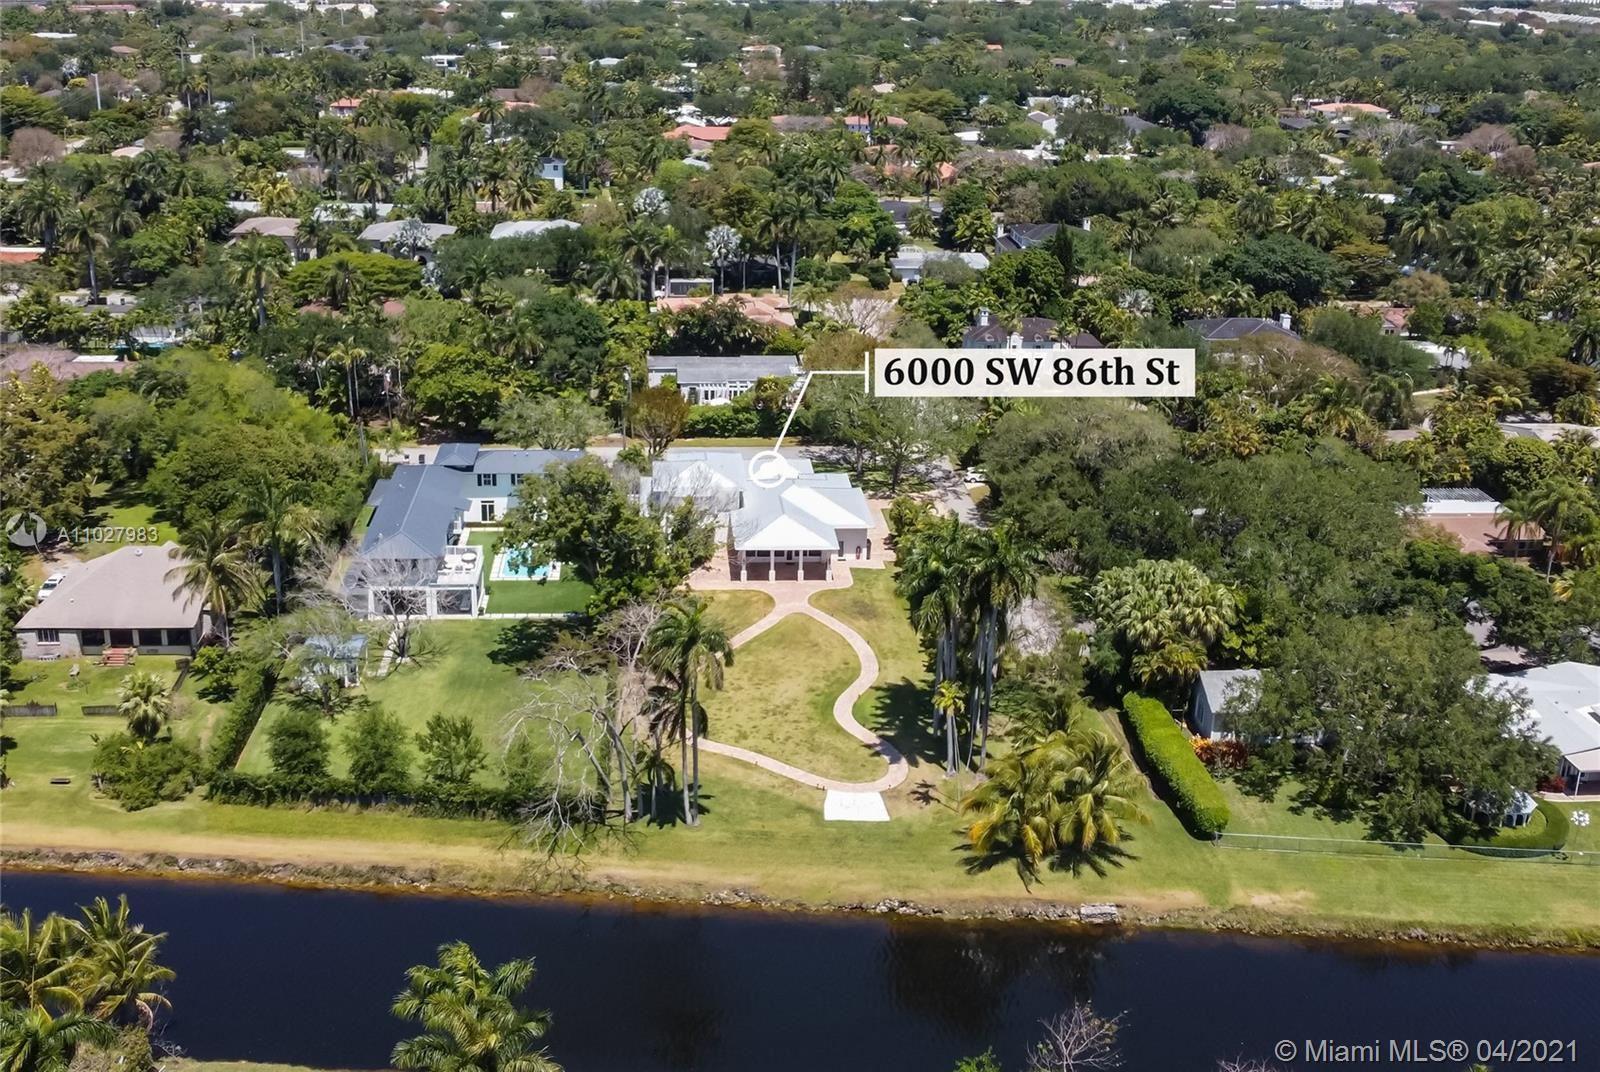 6000 SW 86th St, South Miami, FL 33143 - #: A11027983